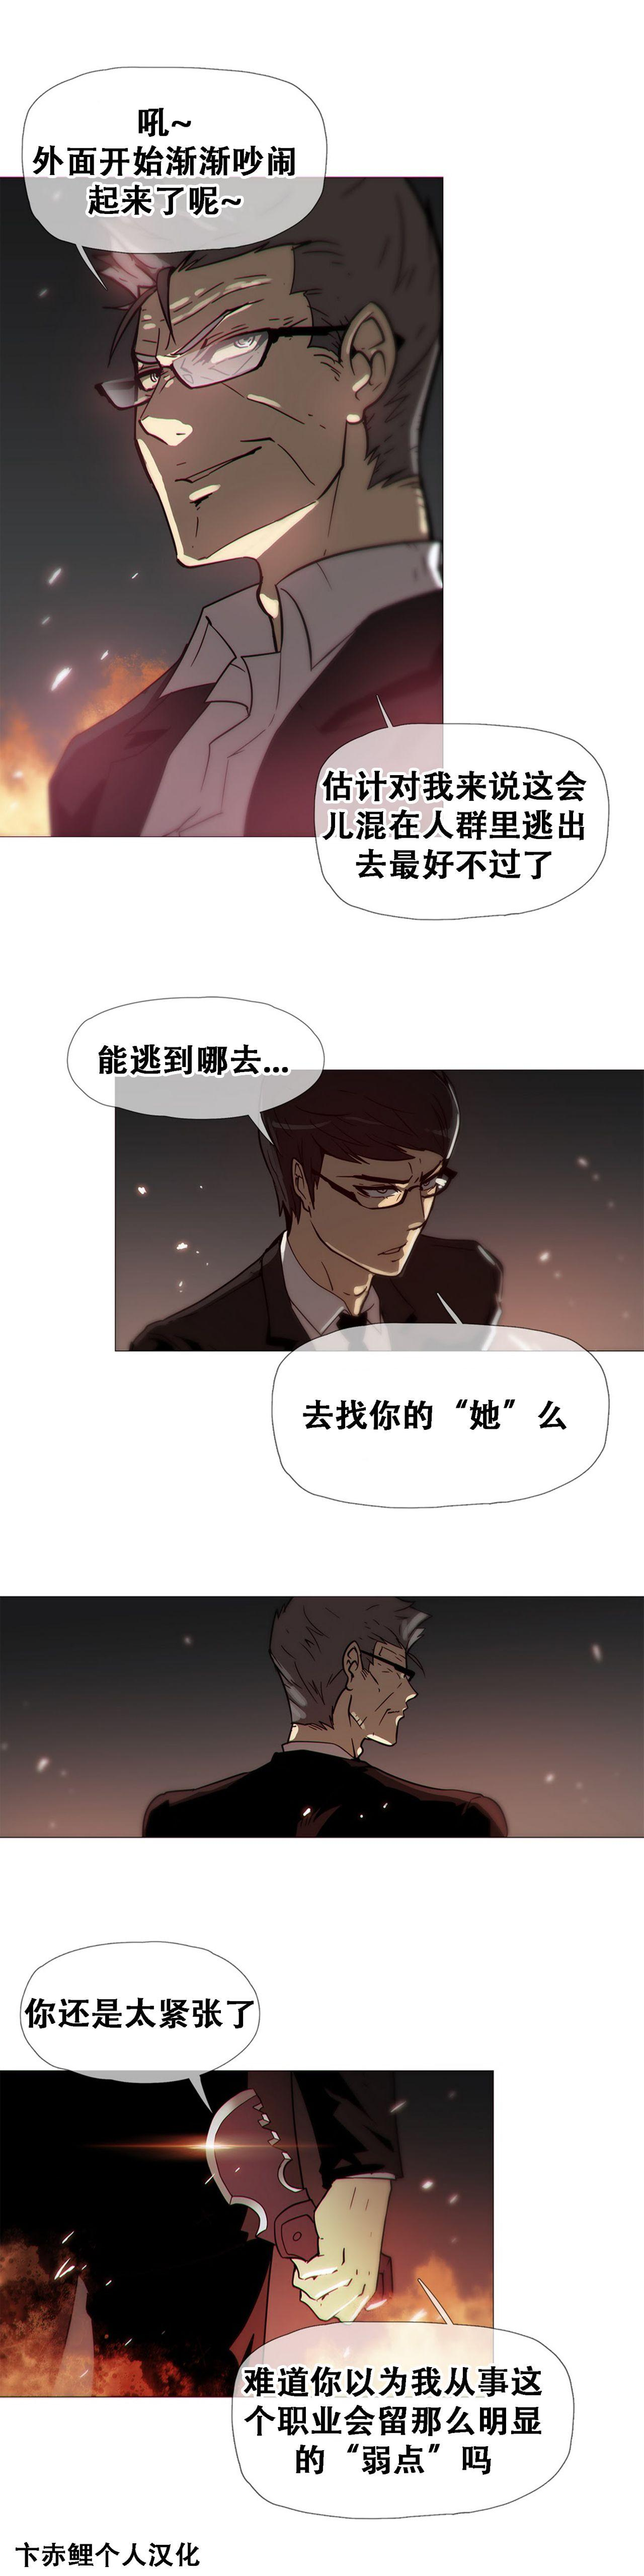 HouseHold Affairs 【卞赤鲤个人汉化】1~33话(持续更新中) 369